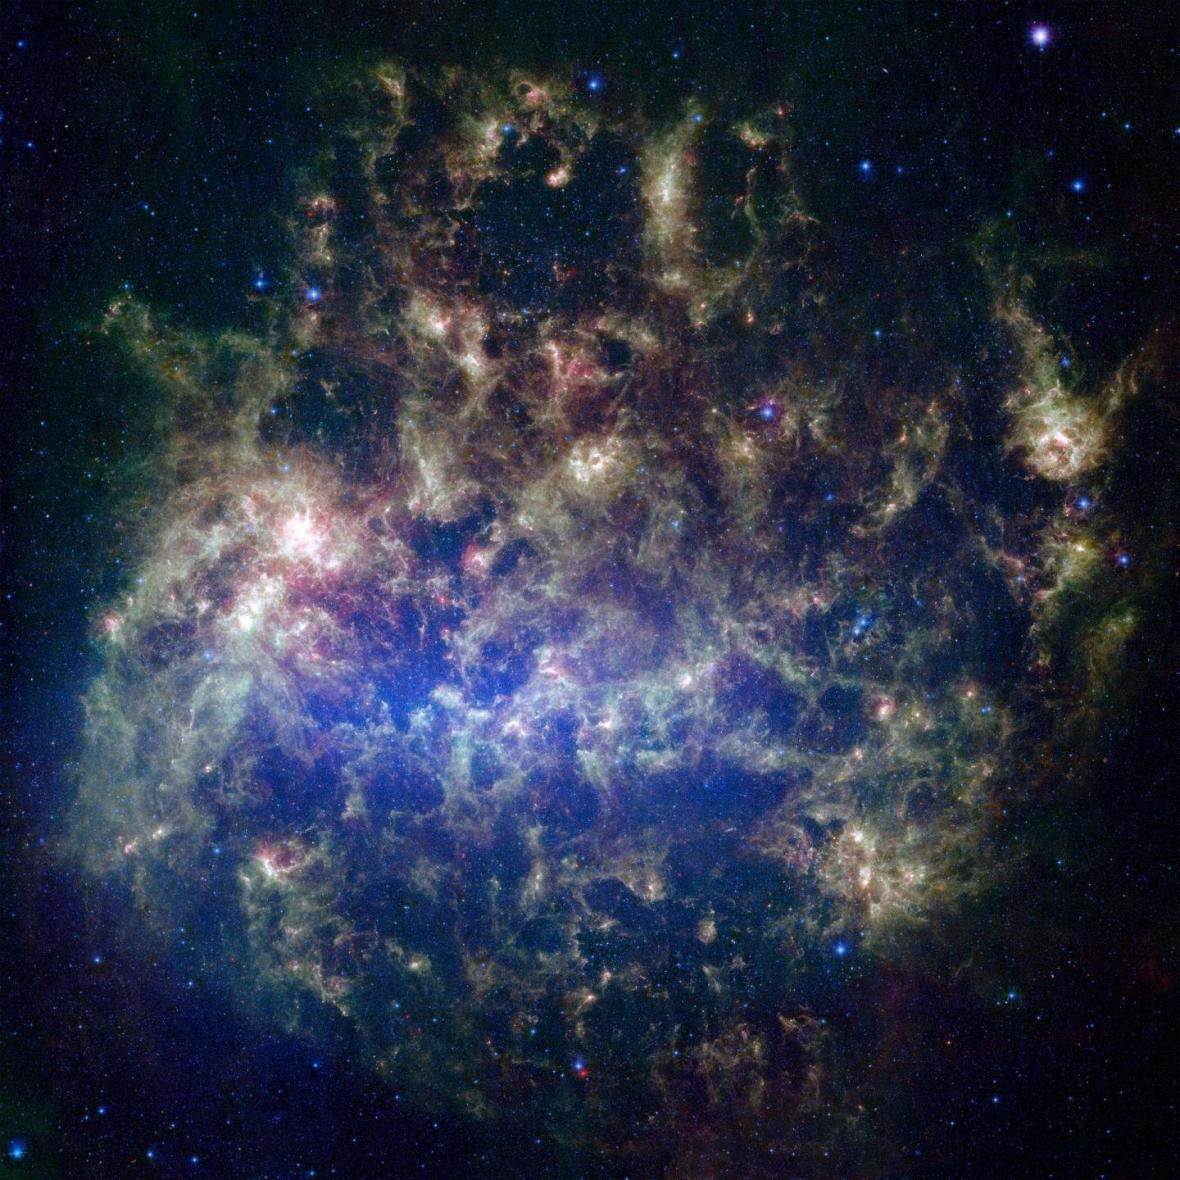 Velký Magellanův oblak